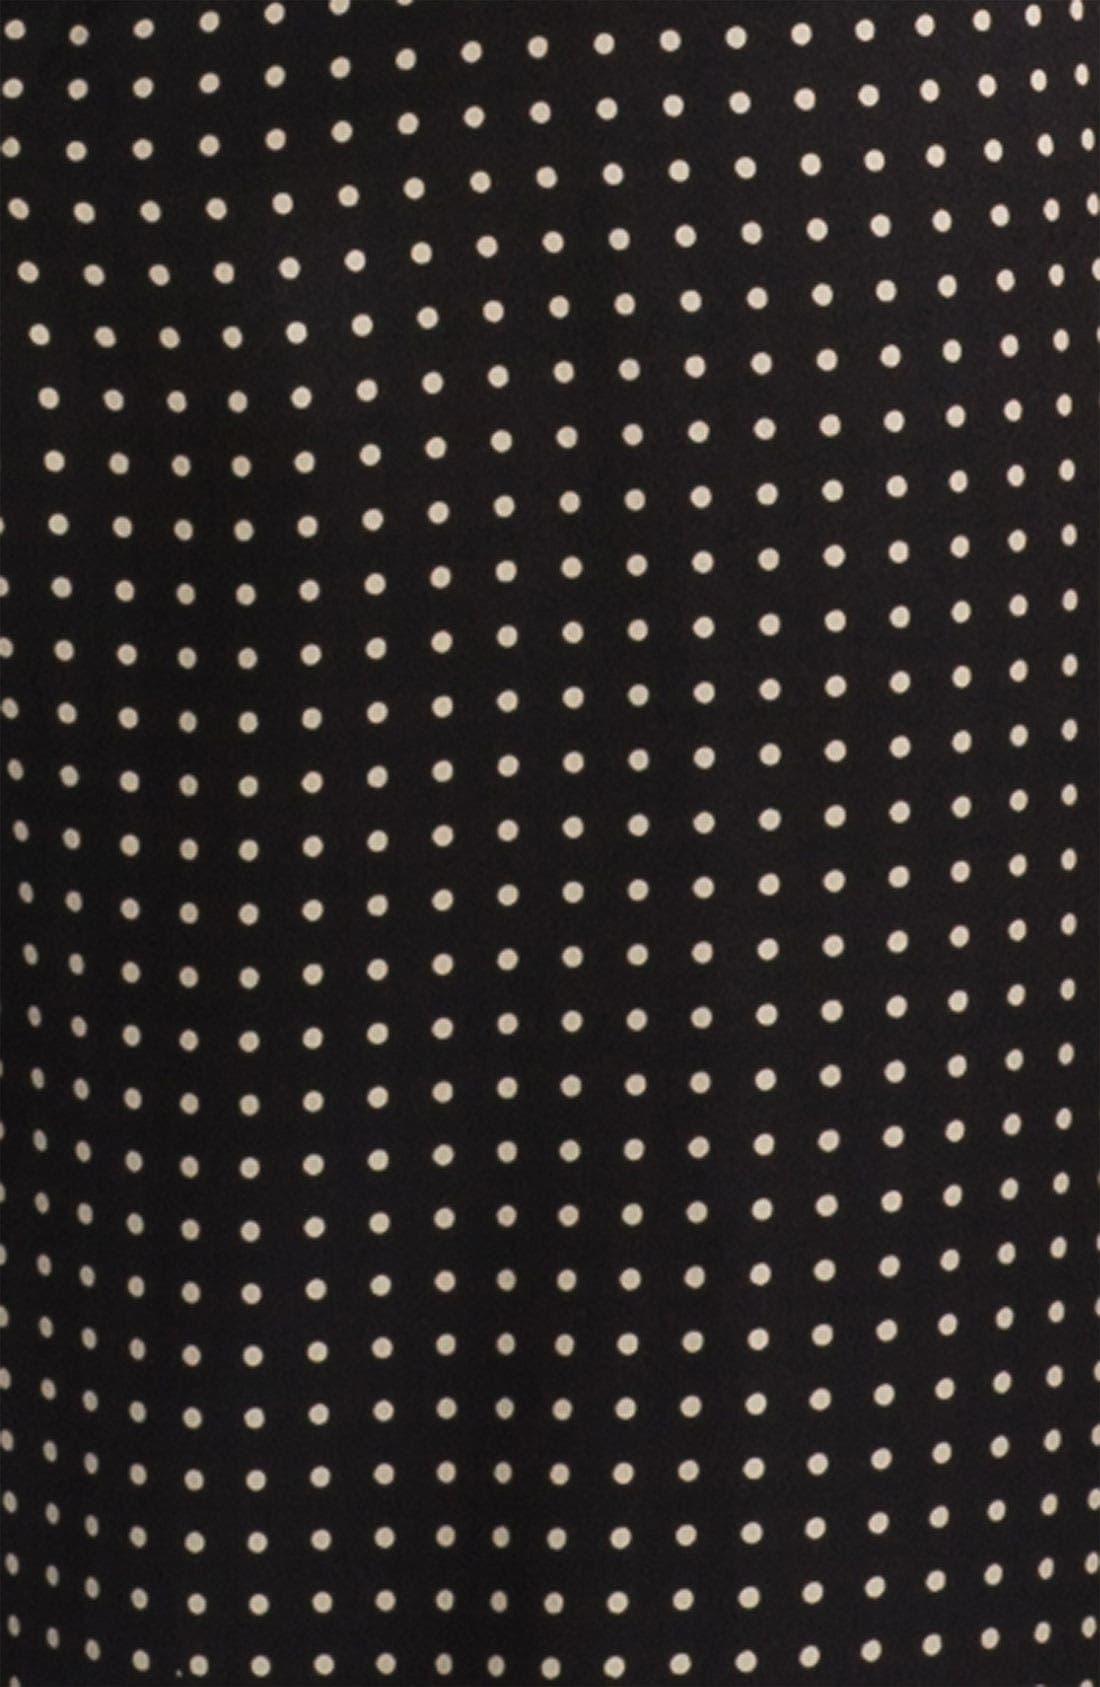 Dot Silk Pajamas,                             Alternate thumbnail 3, color,                             BLACK